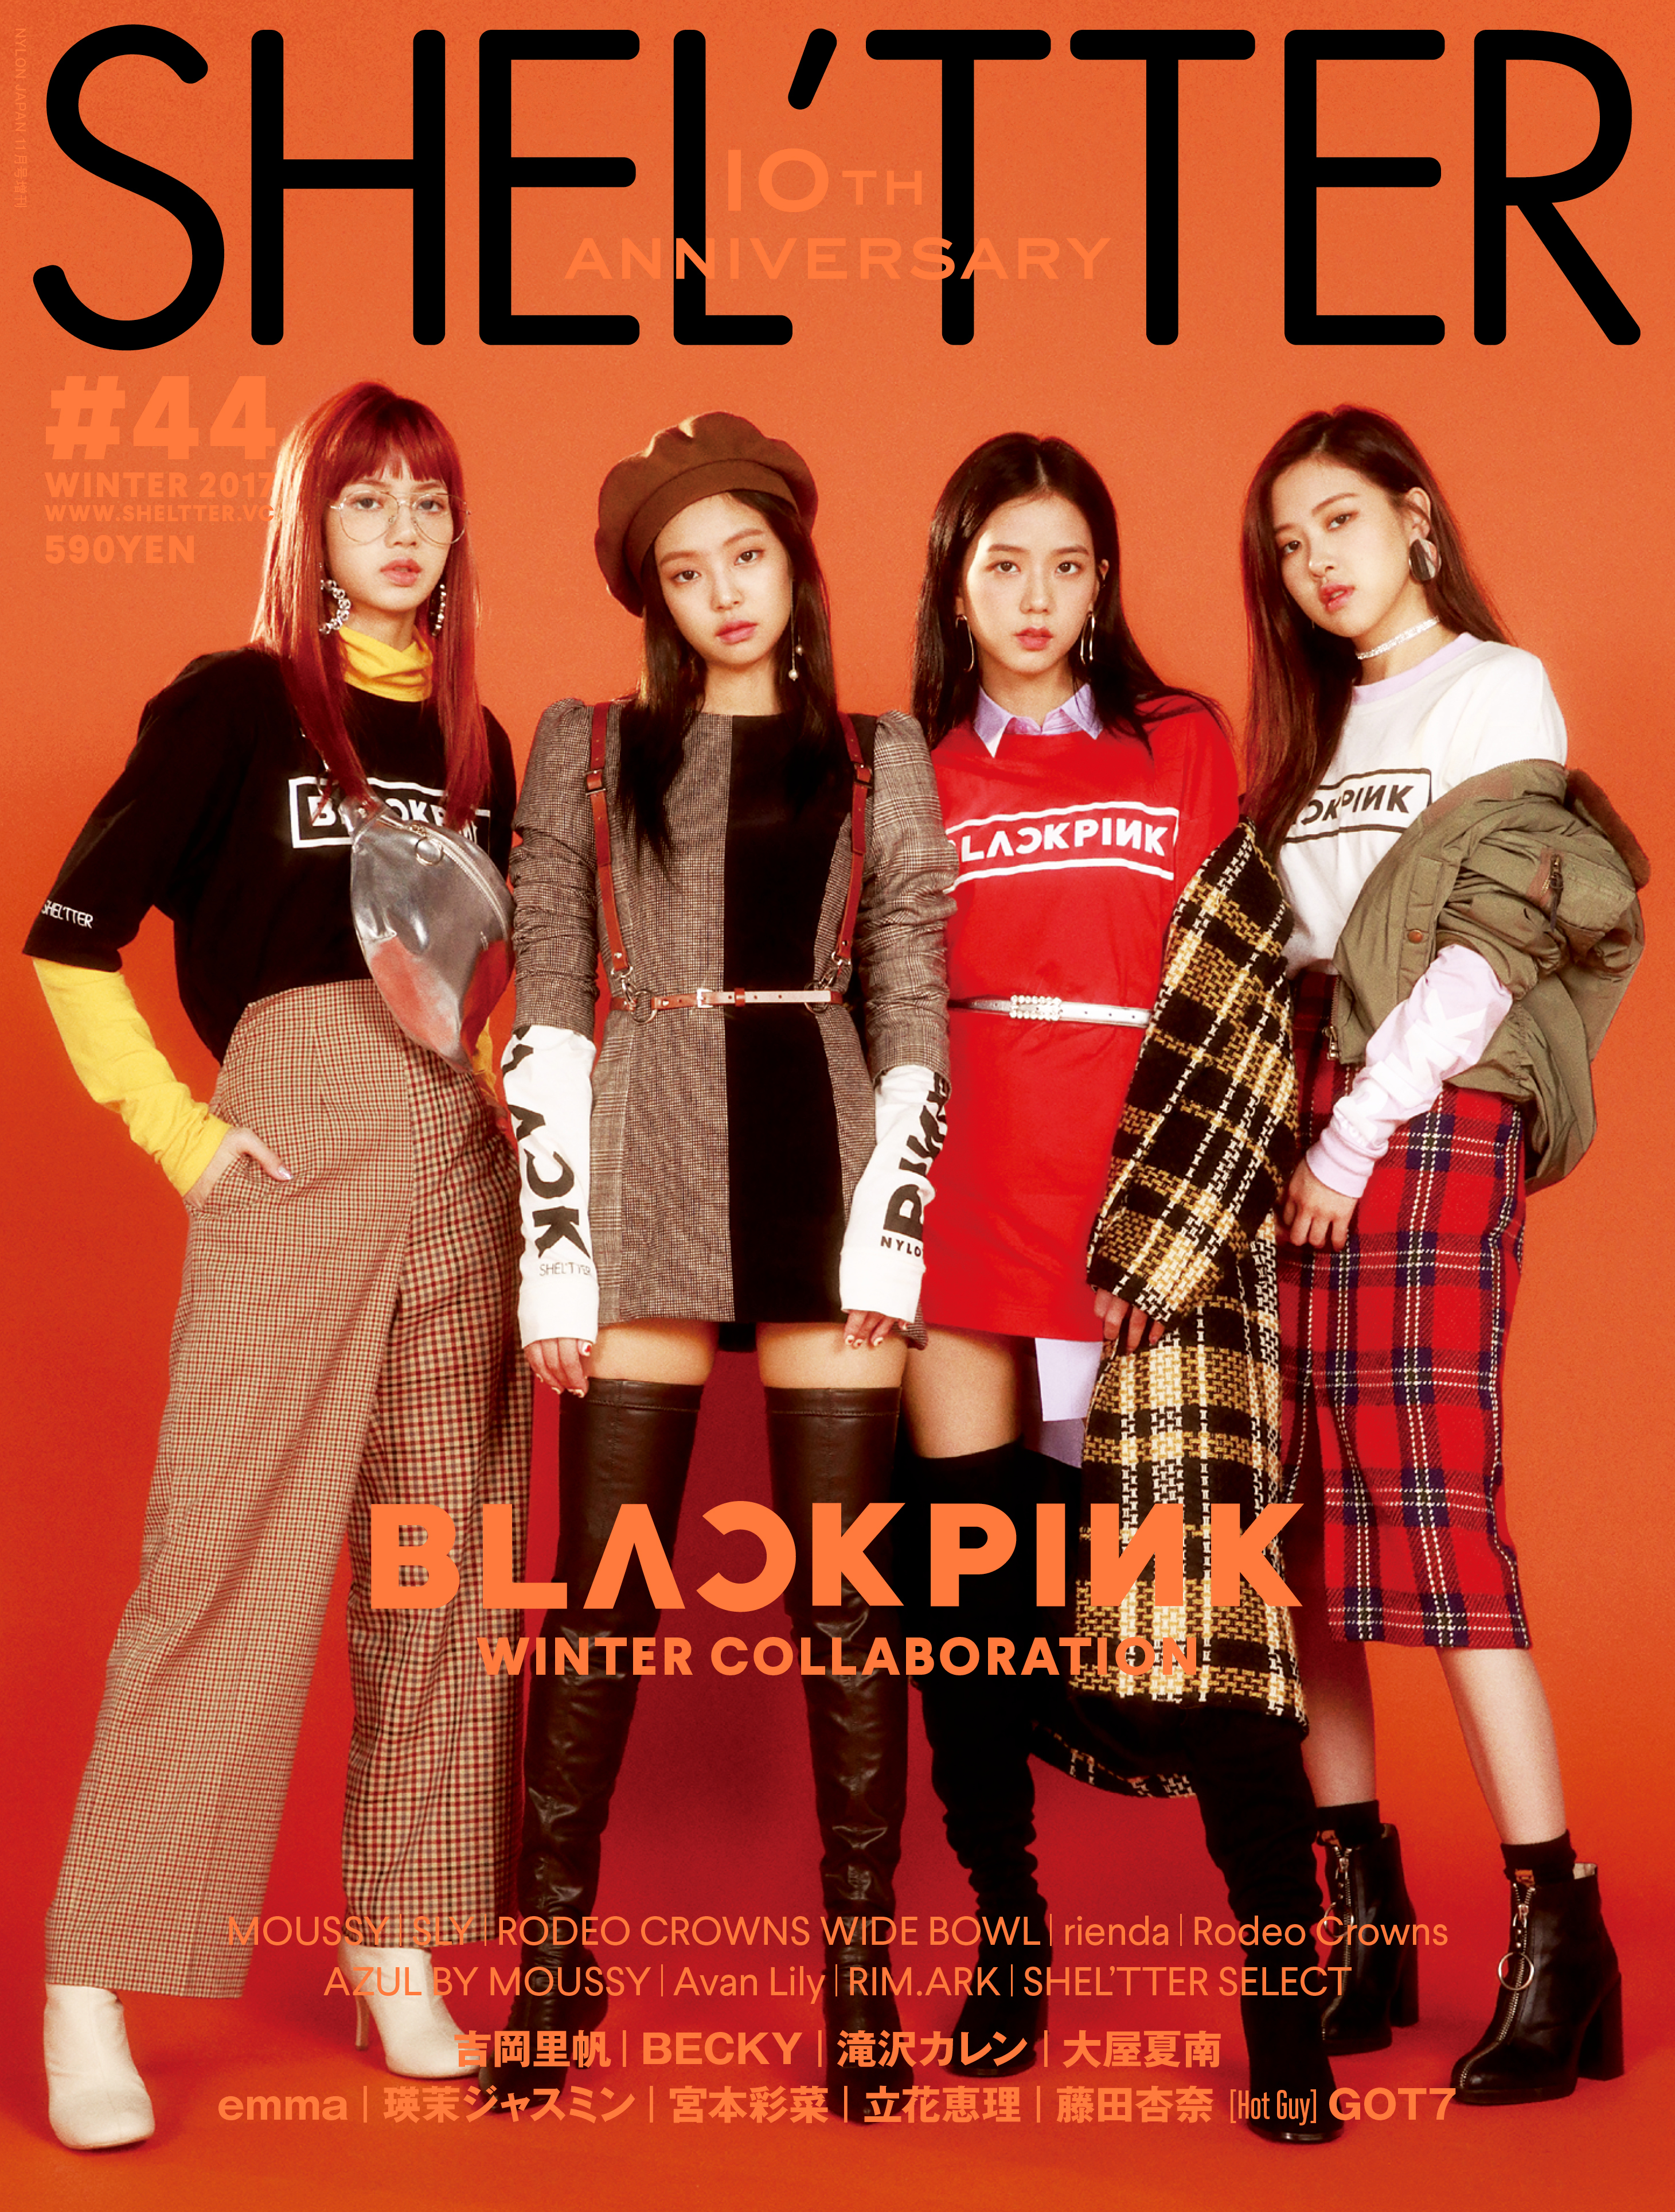 SHELTTER#44_BLACKPINKcover